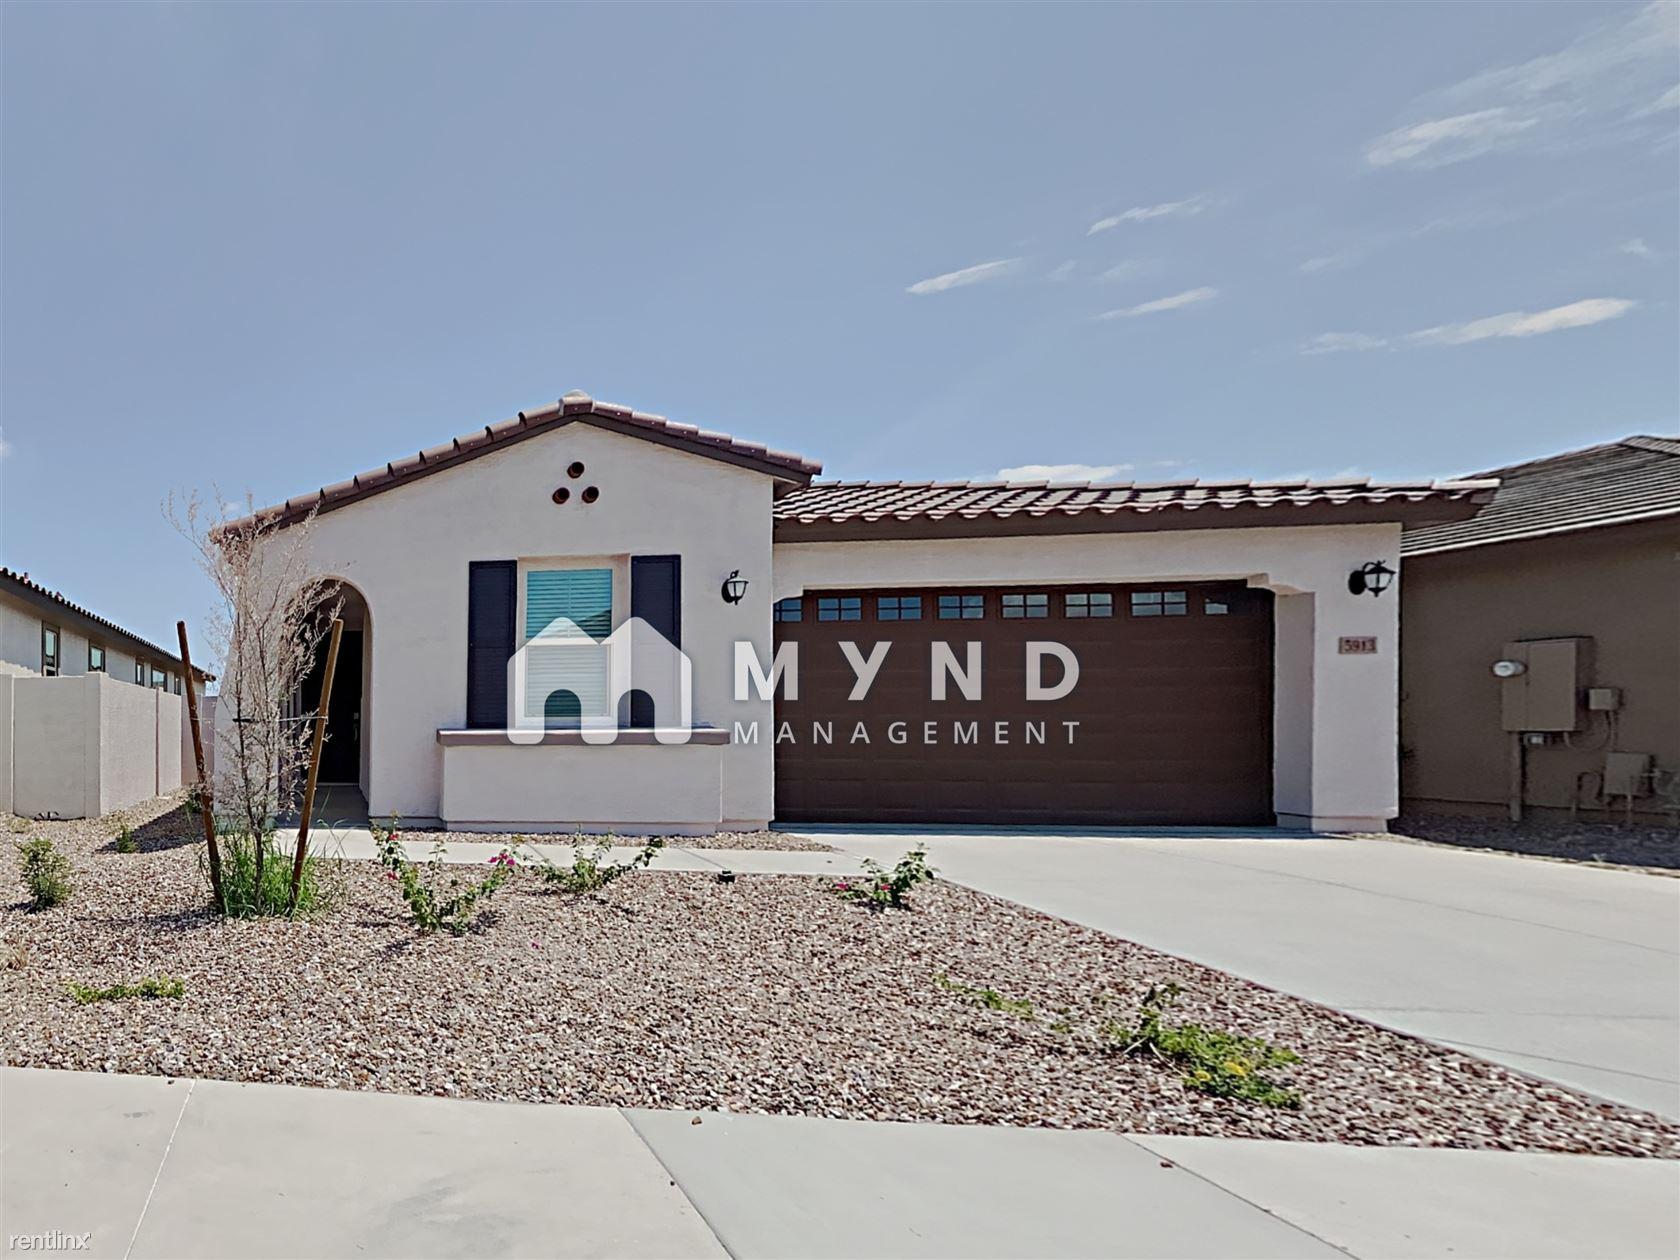 5913 S Arizona Place - 3195USD / month